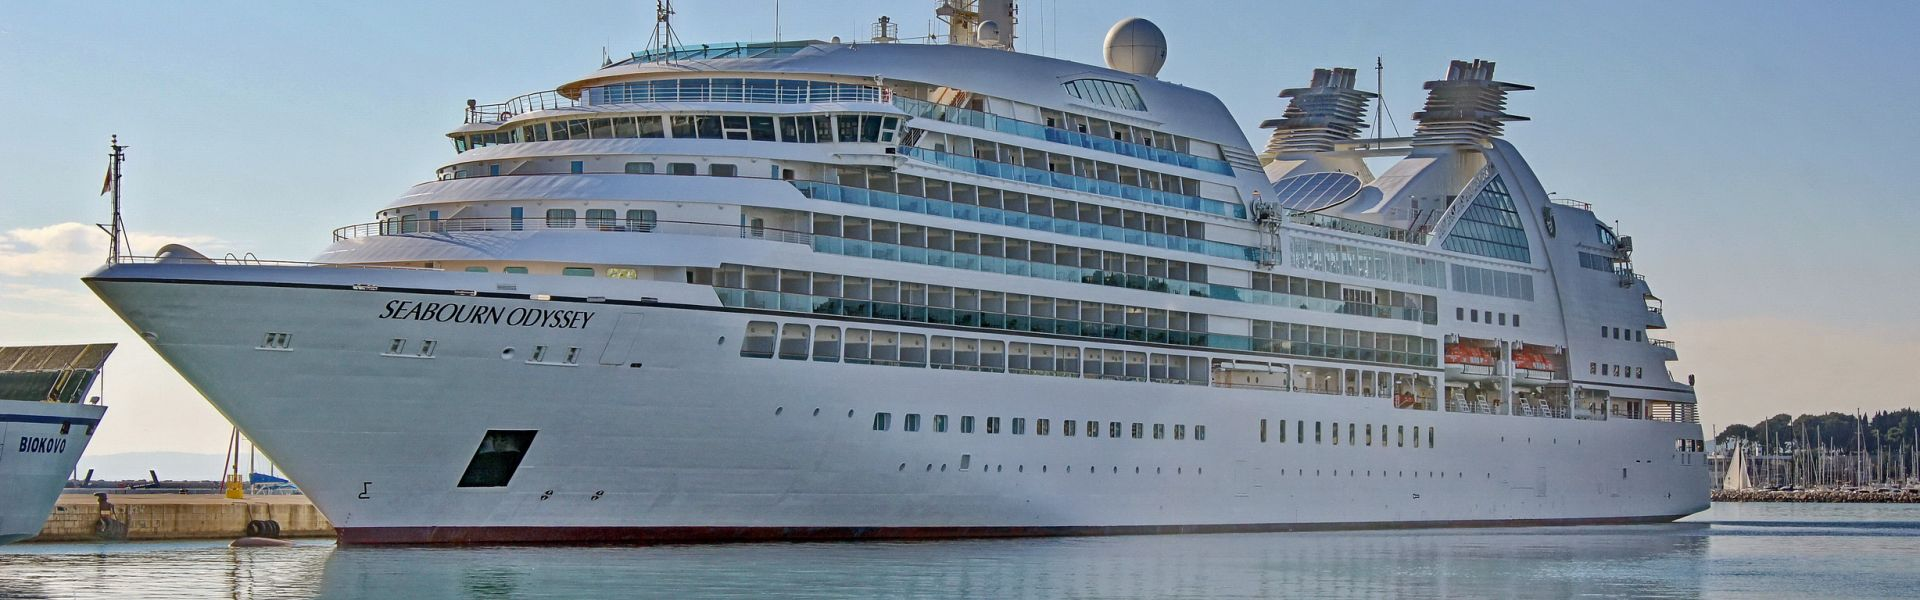 Croaziera 2017 - Caraibe de Est ( Miami ) - Seabourn - Seabourn Odyssey - 10 nopti